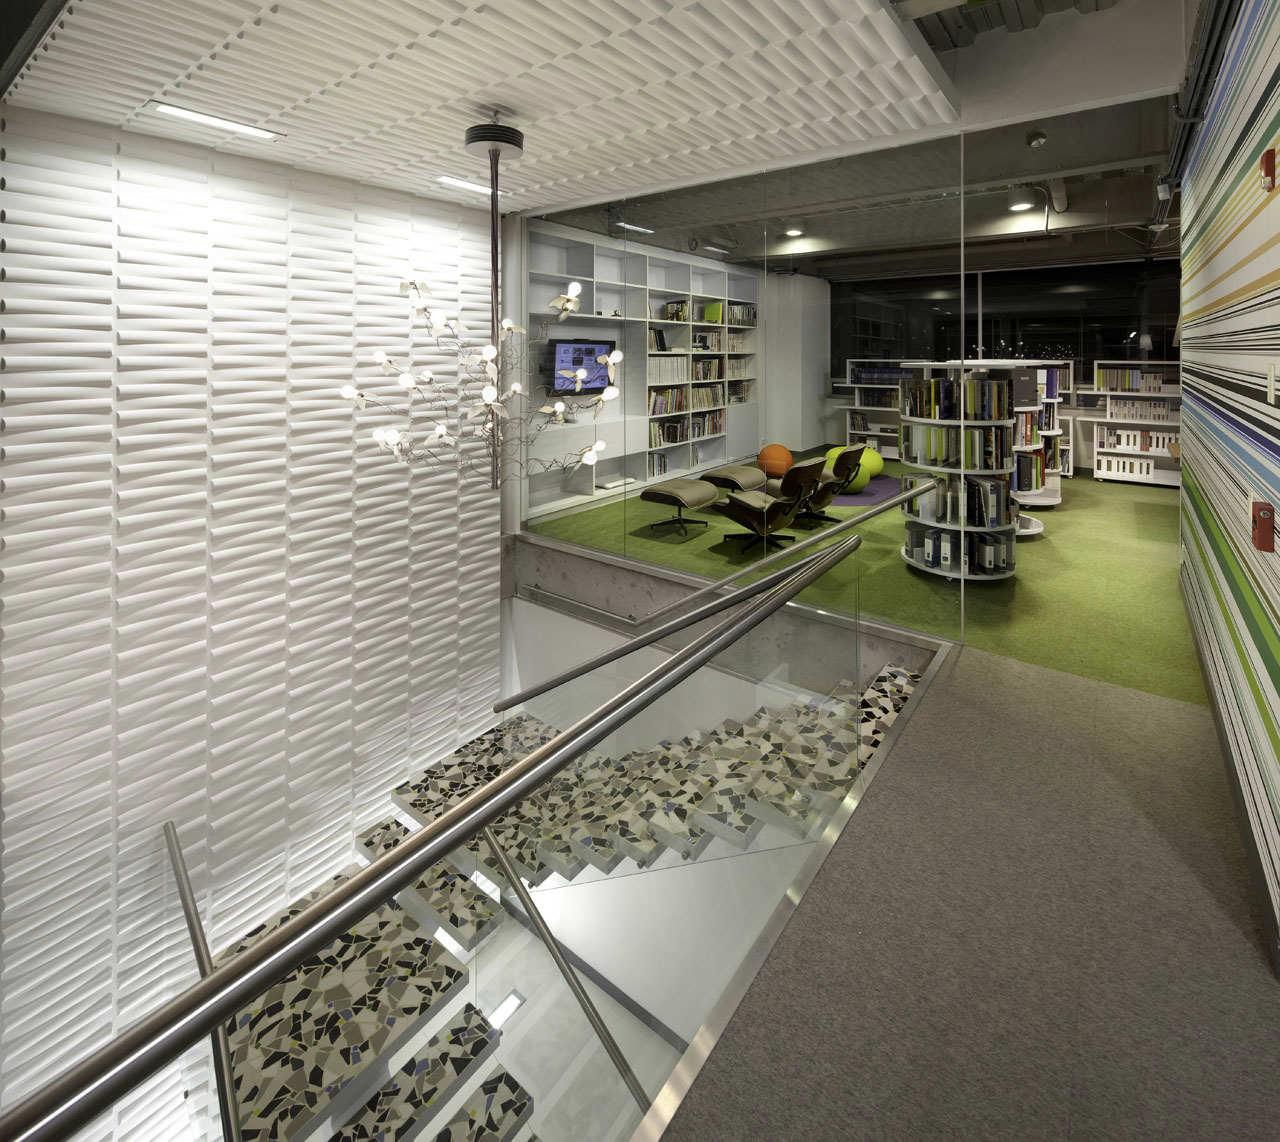 Gallery of aei headquarters arquitectura e interiores 11 for Arquitectura de interiores